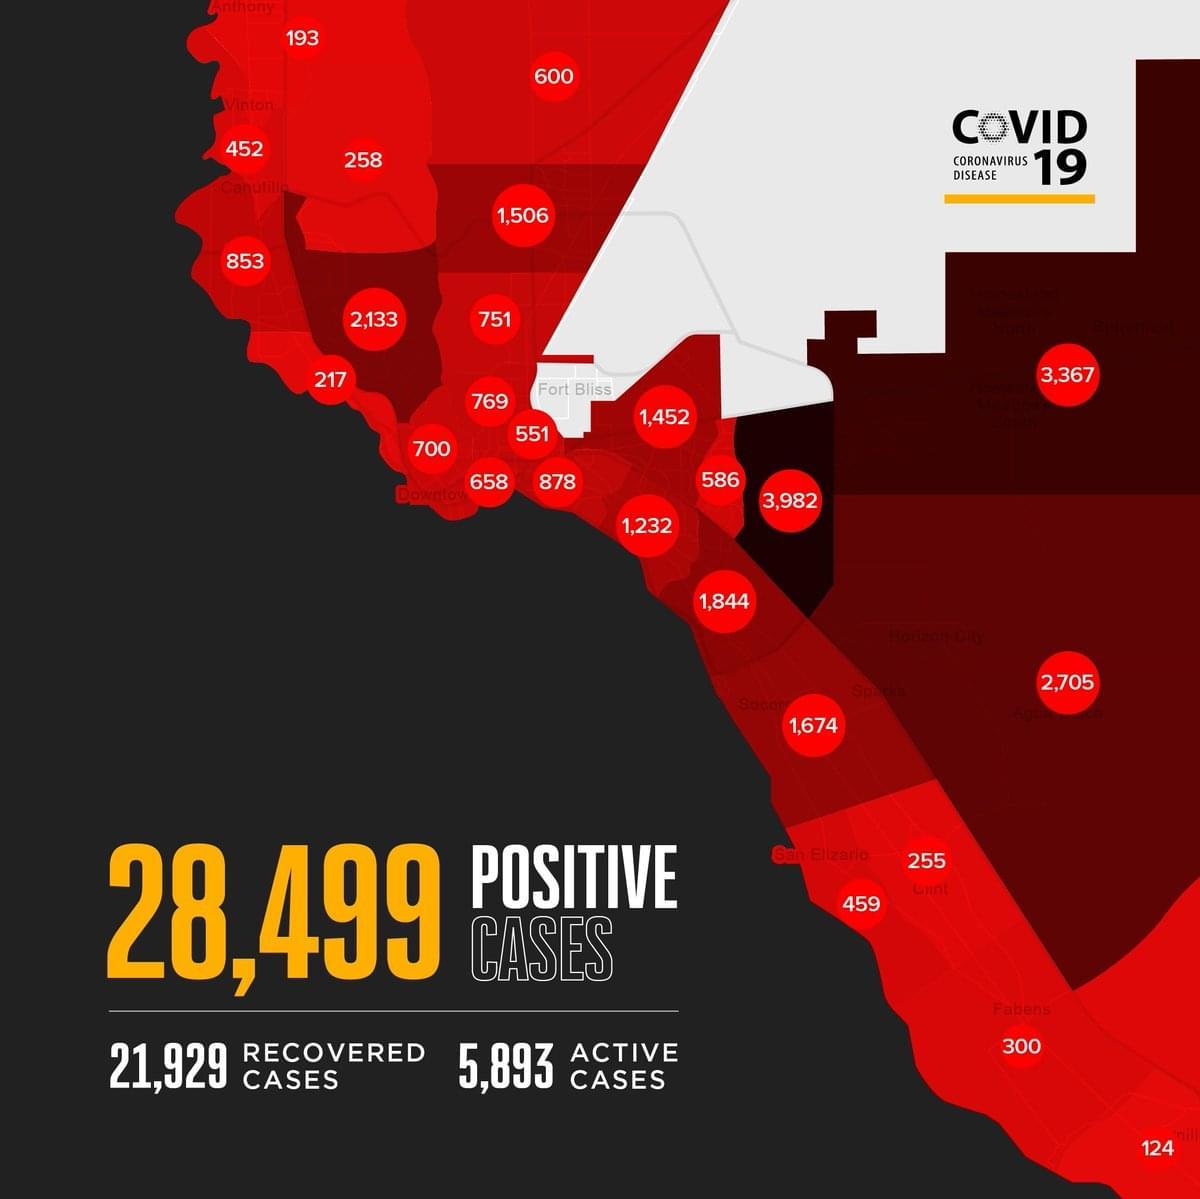 Abbott Sending COVID-19 Team to Tackle El Paso Surge